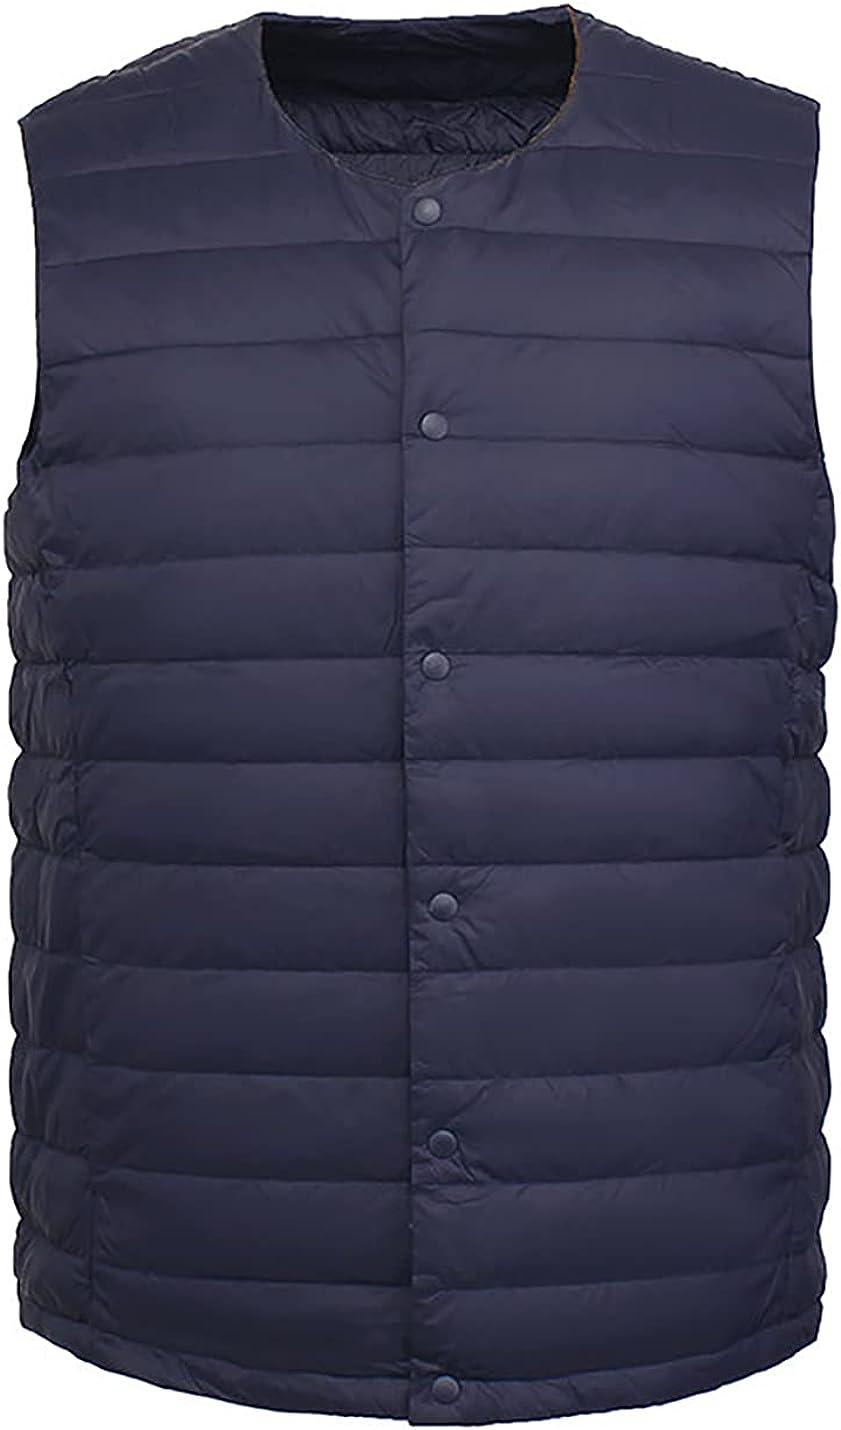 PEHMEA Men's Water-Resistant Packable Puffer Vest Lightweight Sleeveless Quilted Winter Jackets Gilet